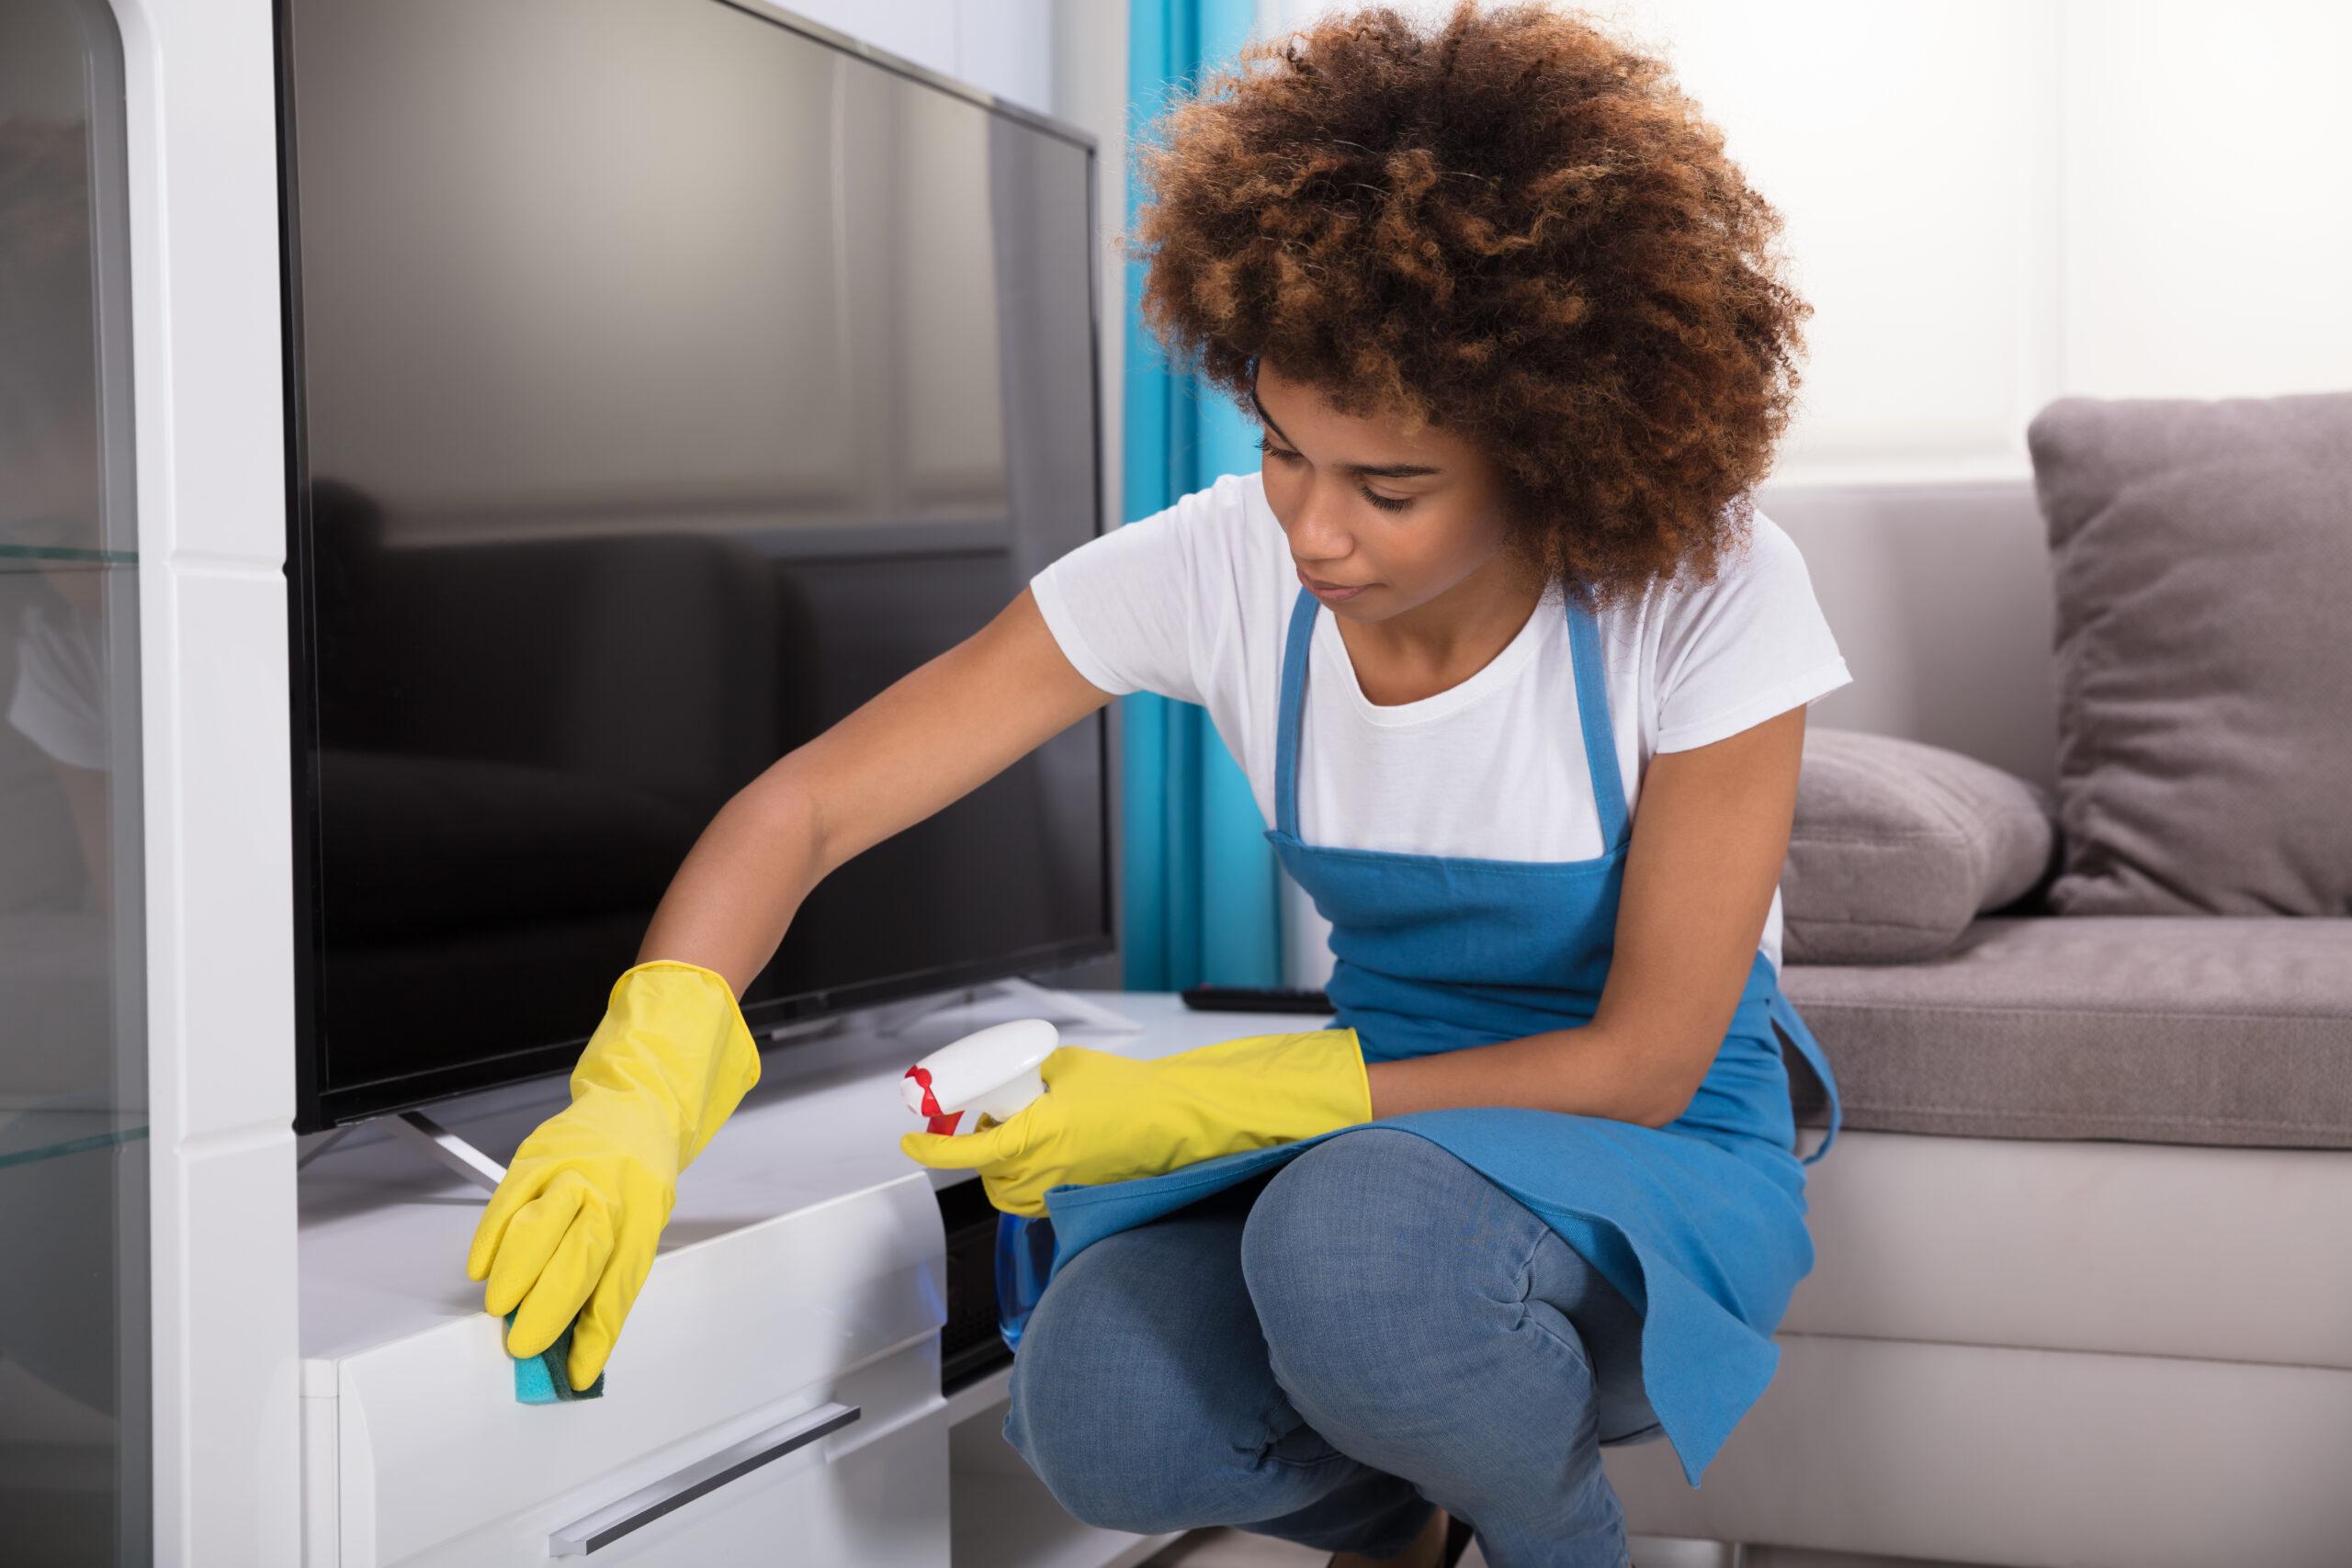 Upscale Furniture Rental Sanitation as Safety Policies